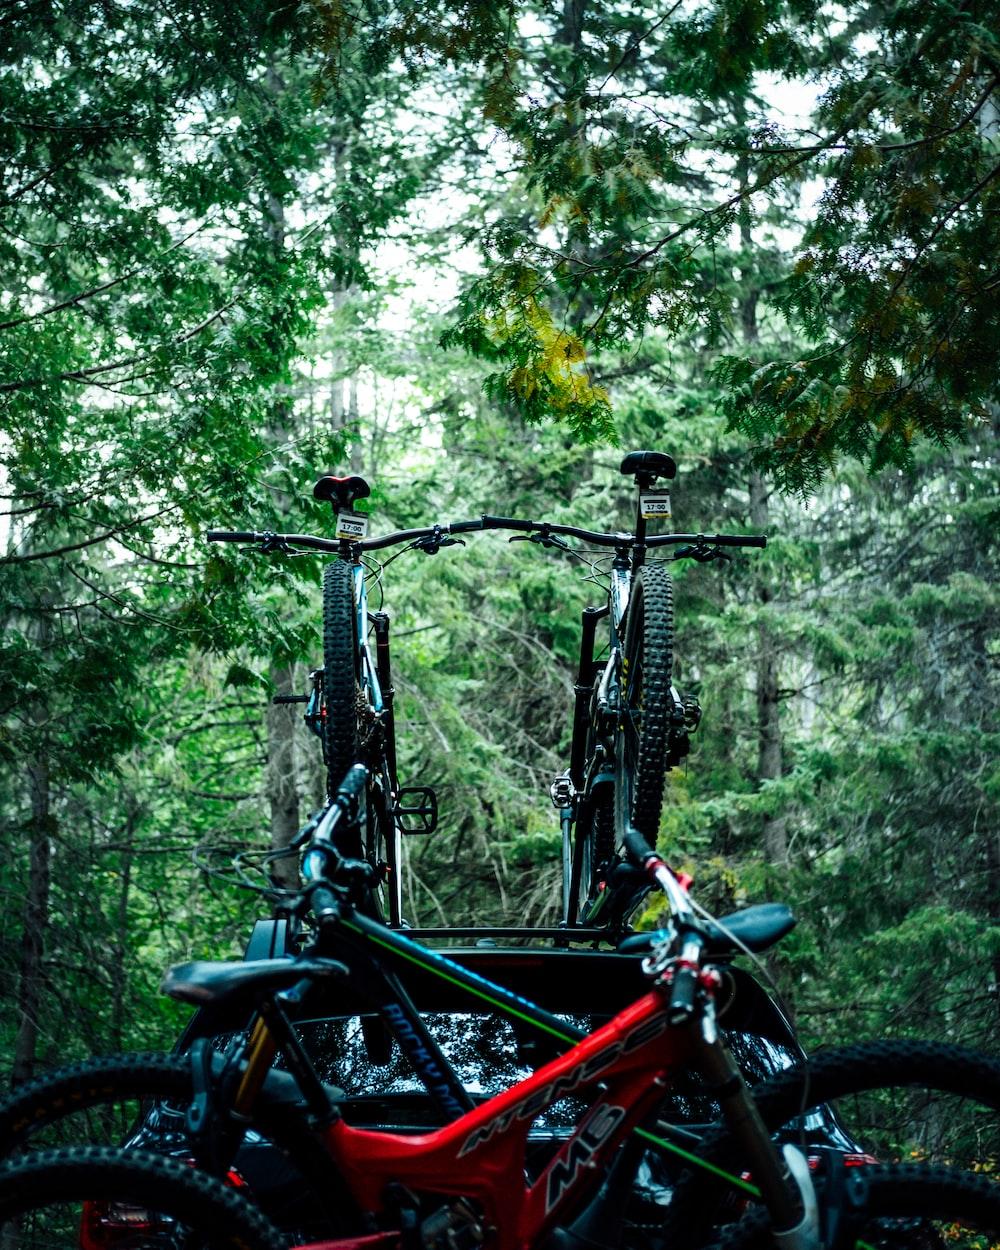 pike of bikes near trees